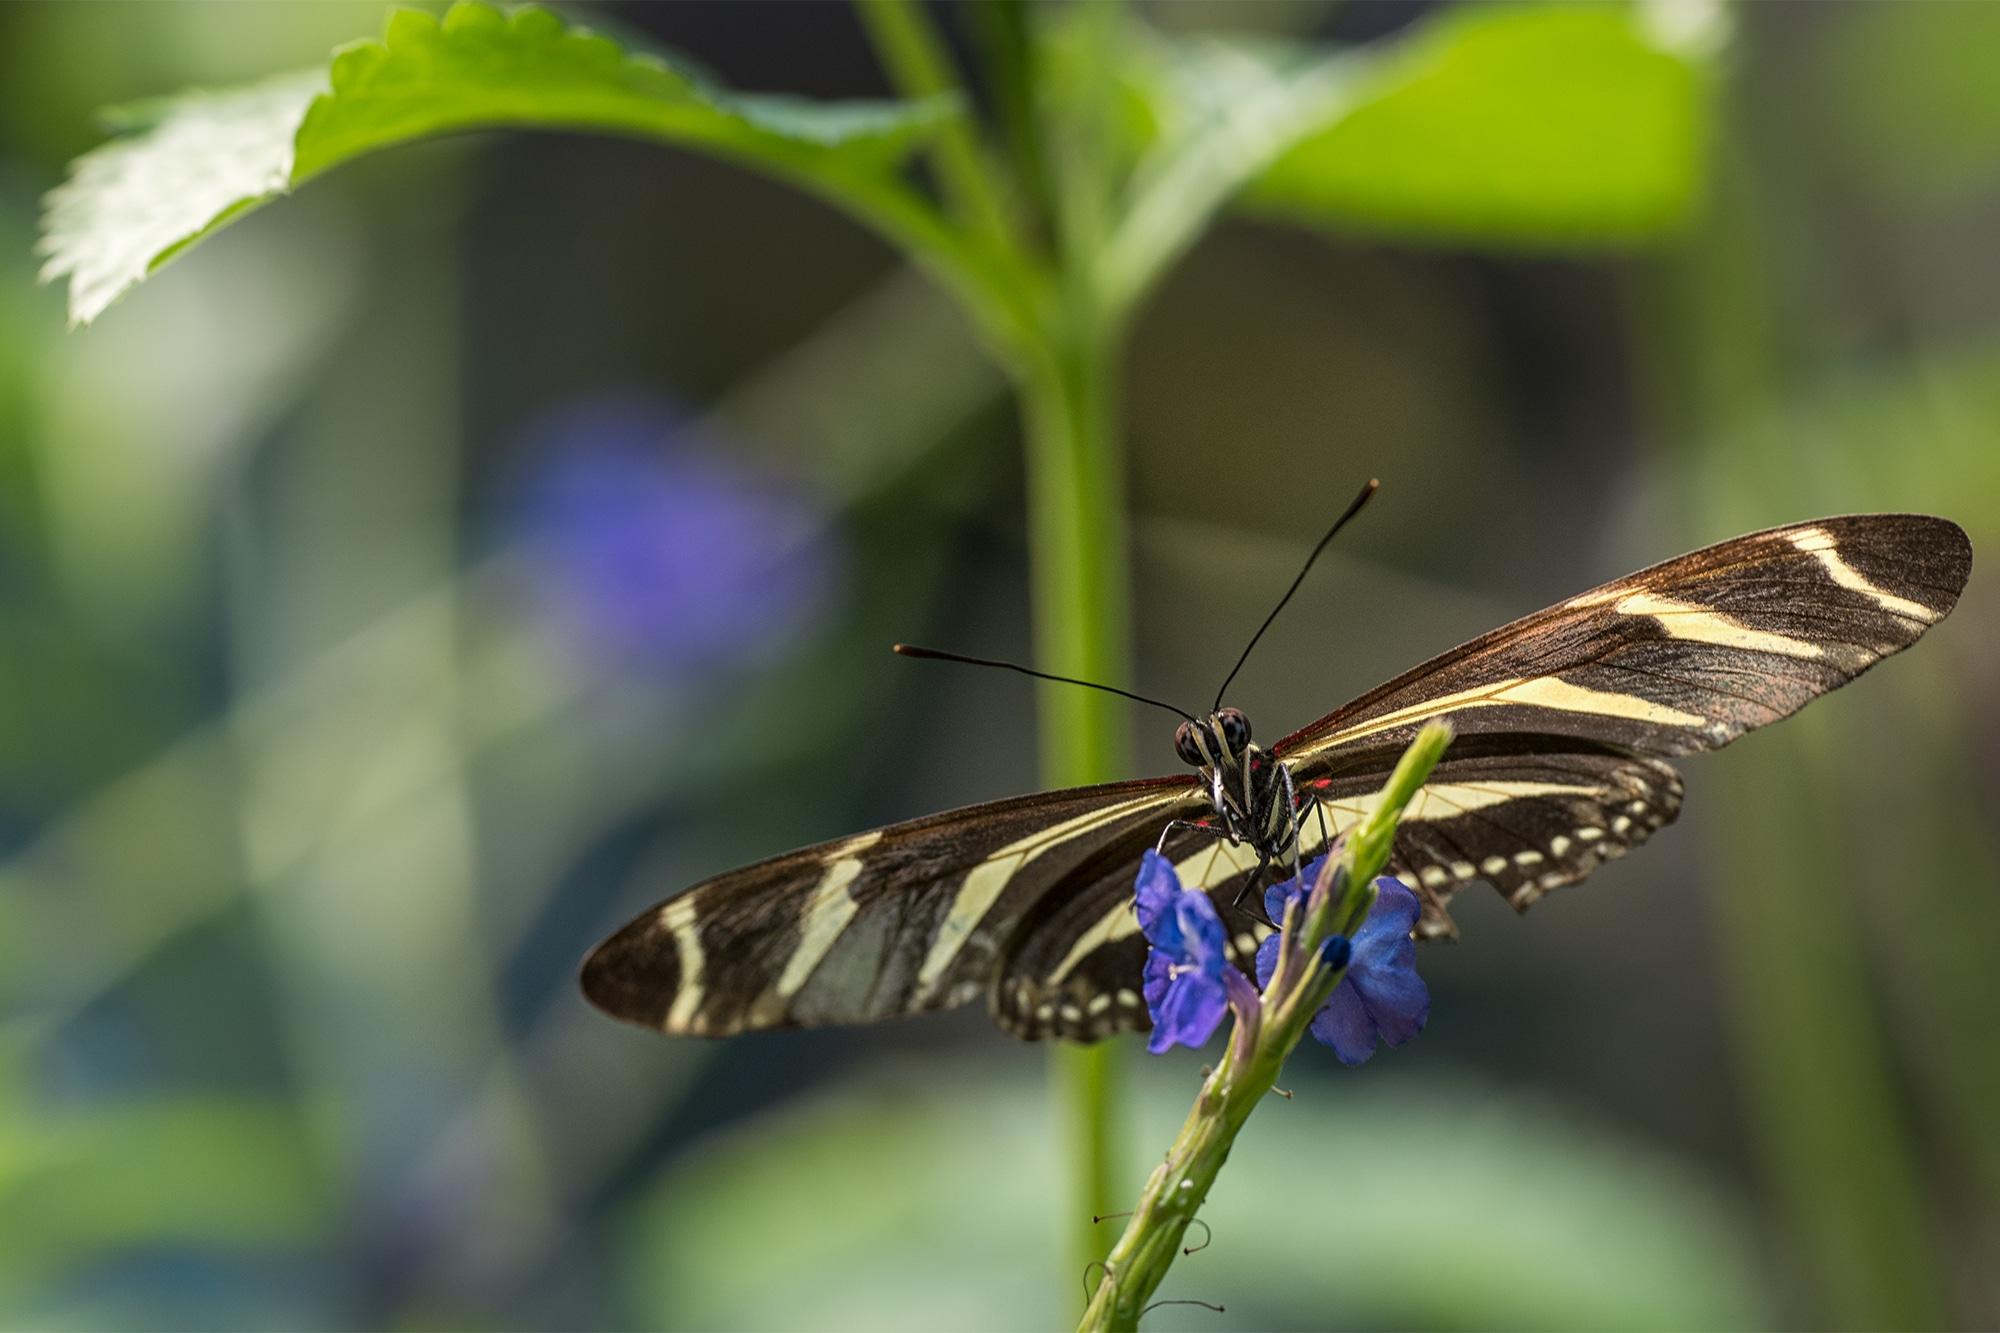 vlinder-2000x1333